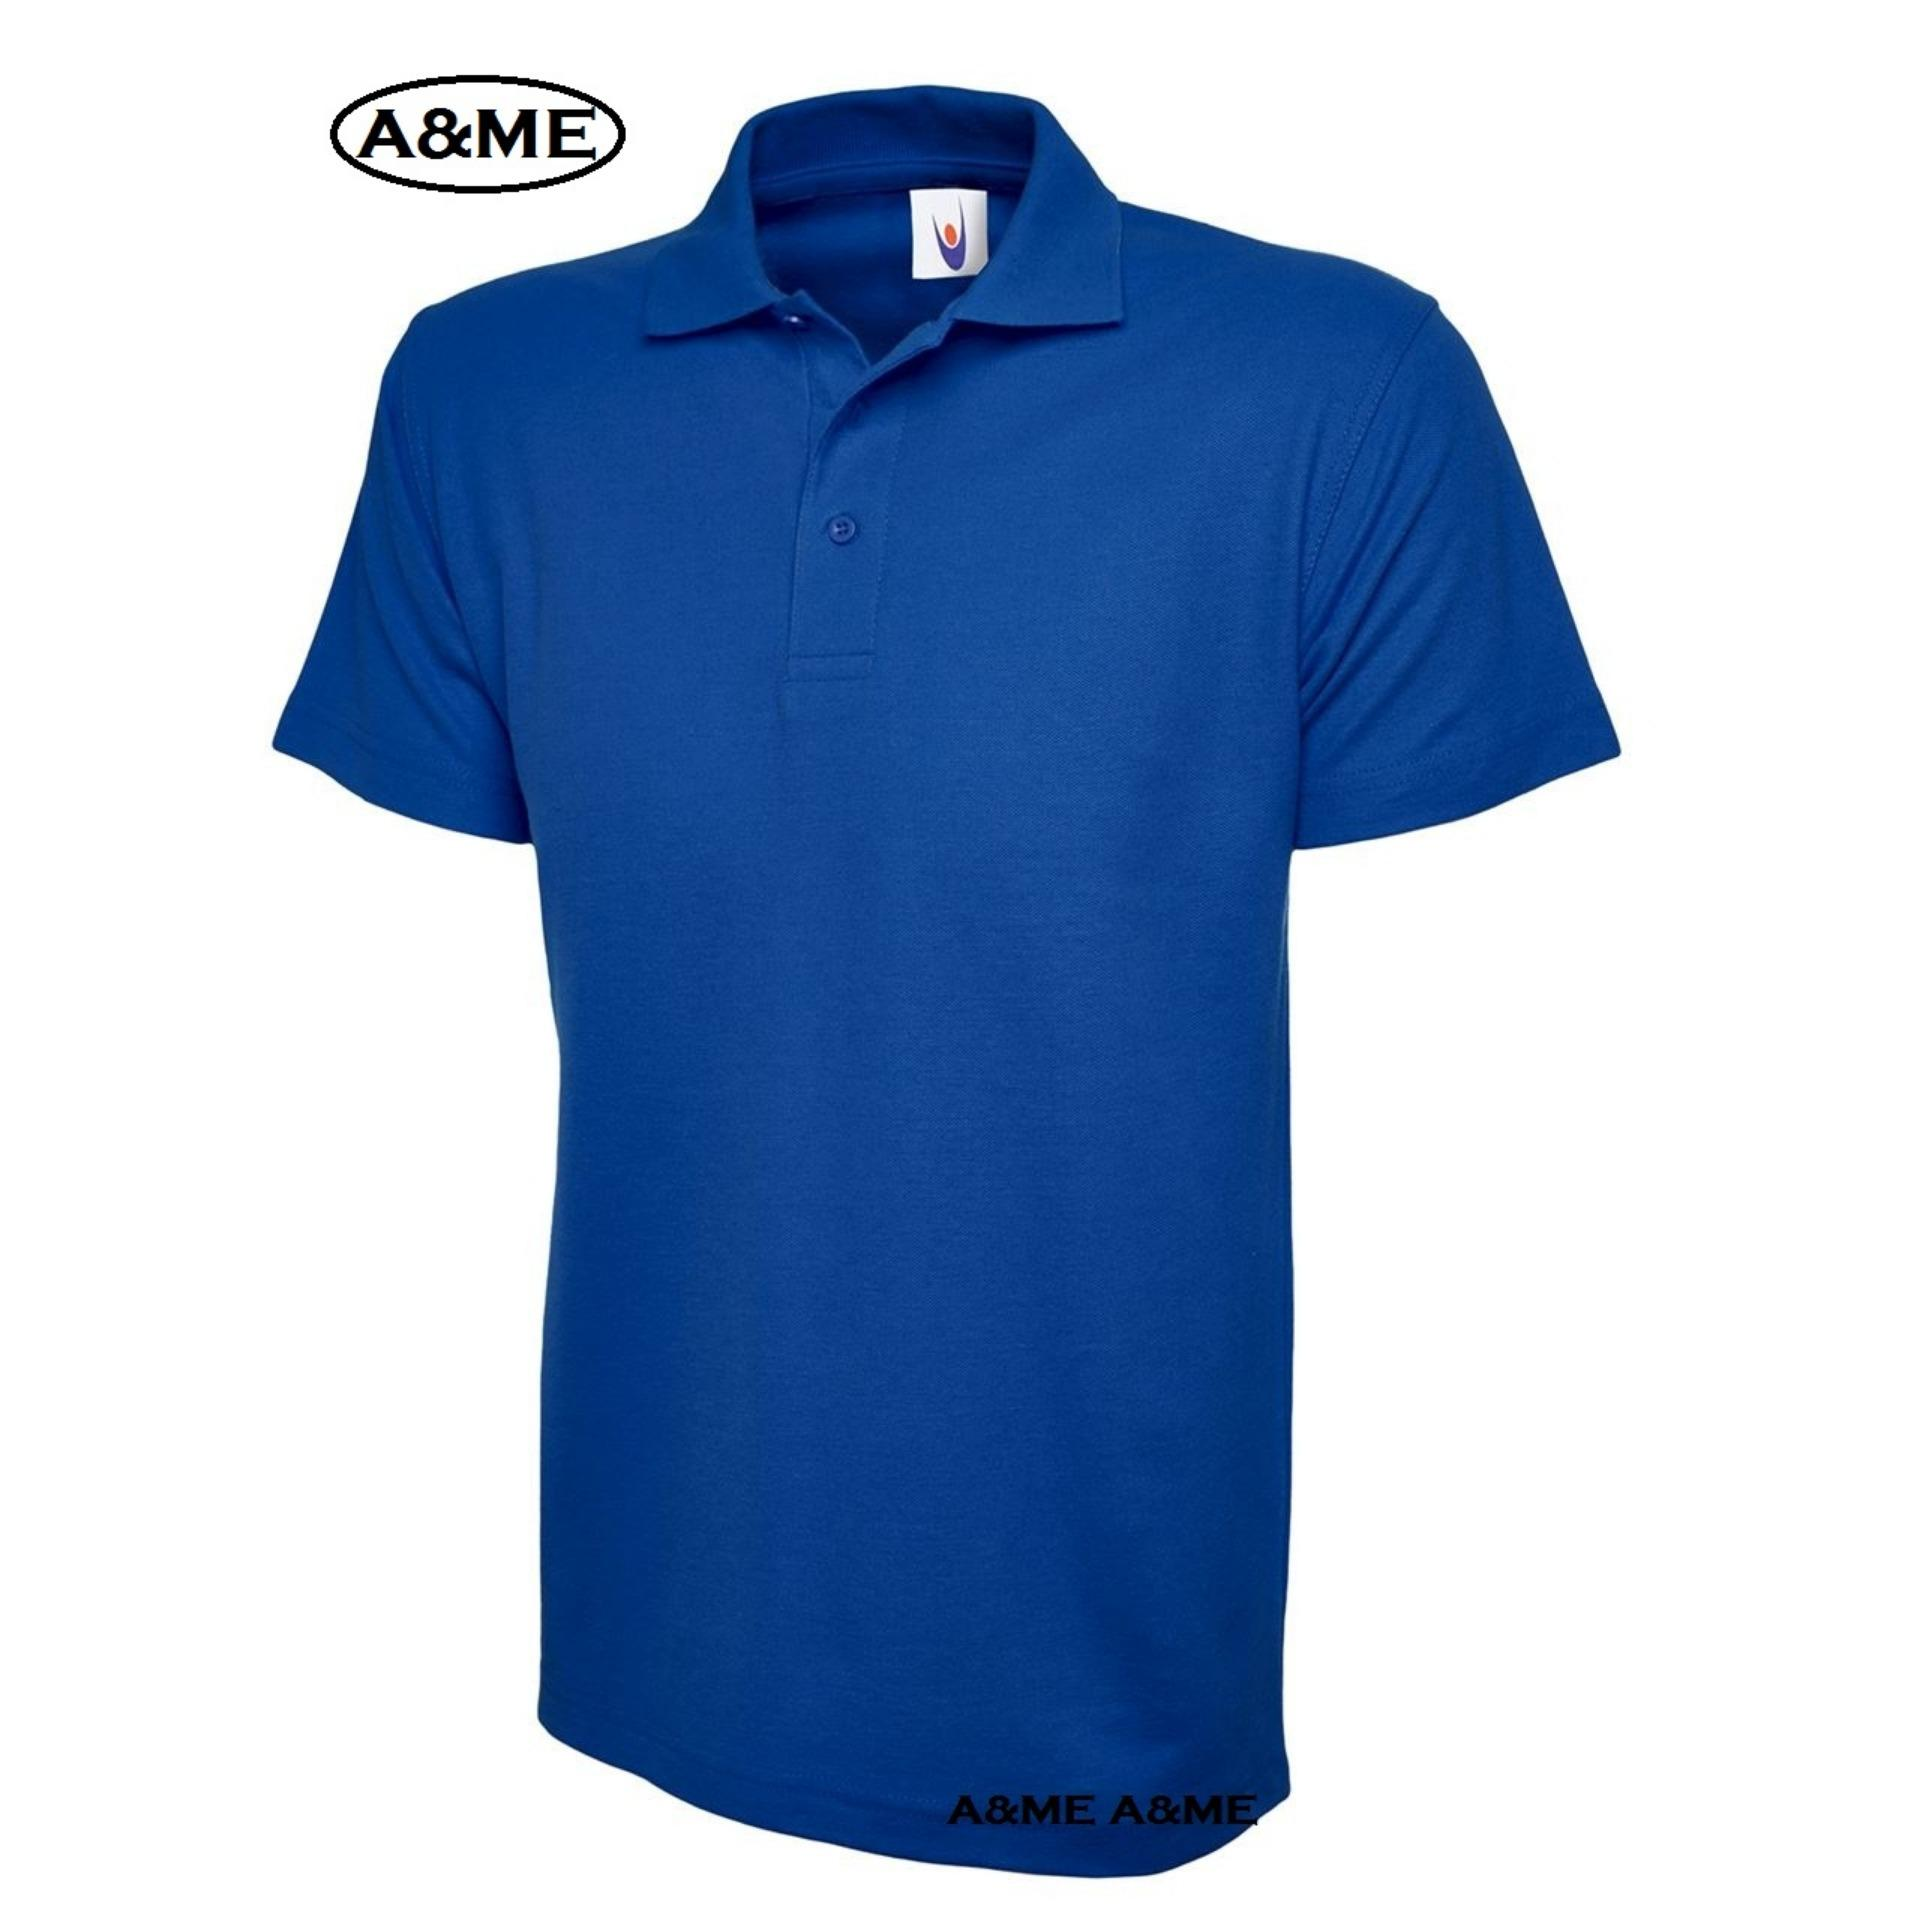 A&ME-Kaos Polo Shirt  M L XL Lengan Pendek Baju Pakaian Olah Raga Kaos Kerah Atasan Pria Wanita Lacos Pique Fashion Keren Nyaman Bagus Simple - Biru 02